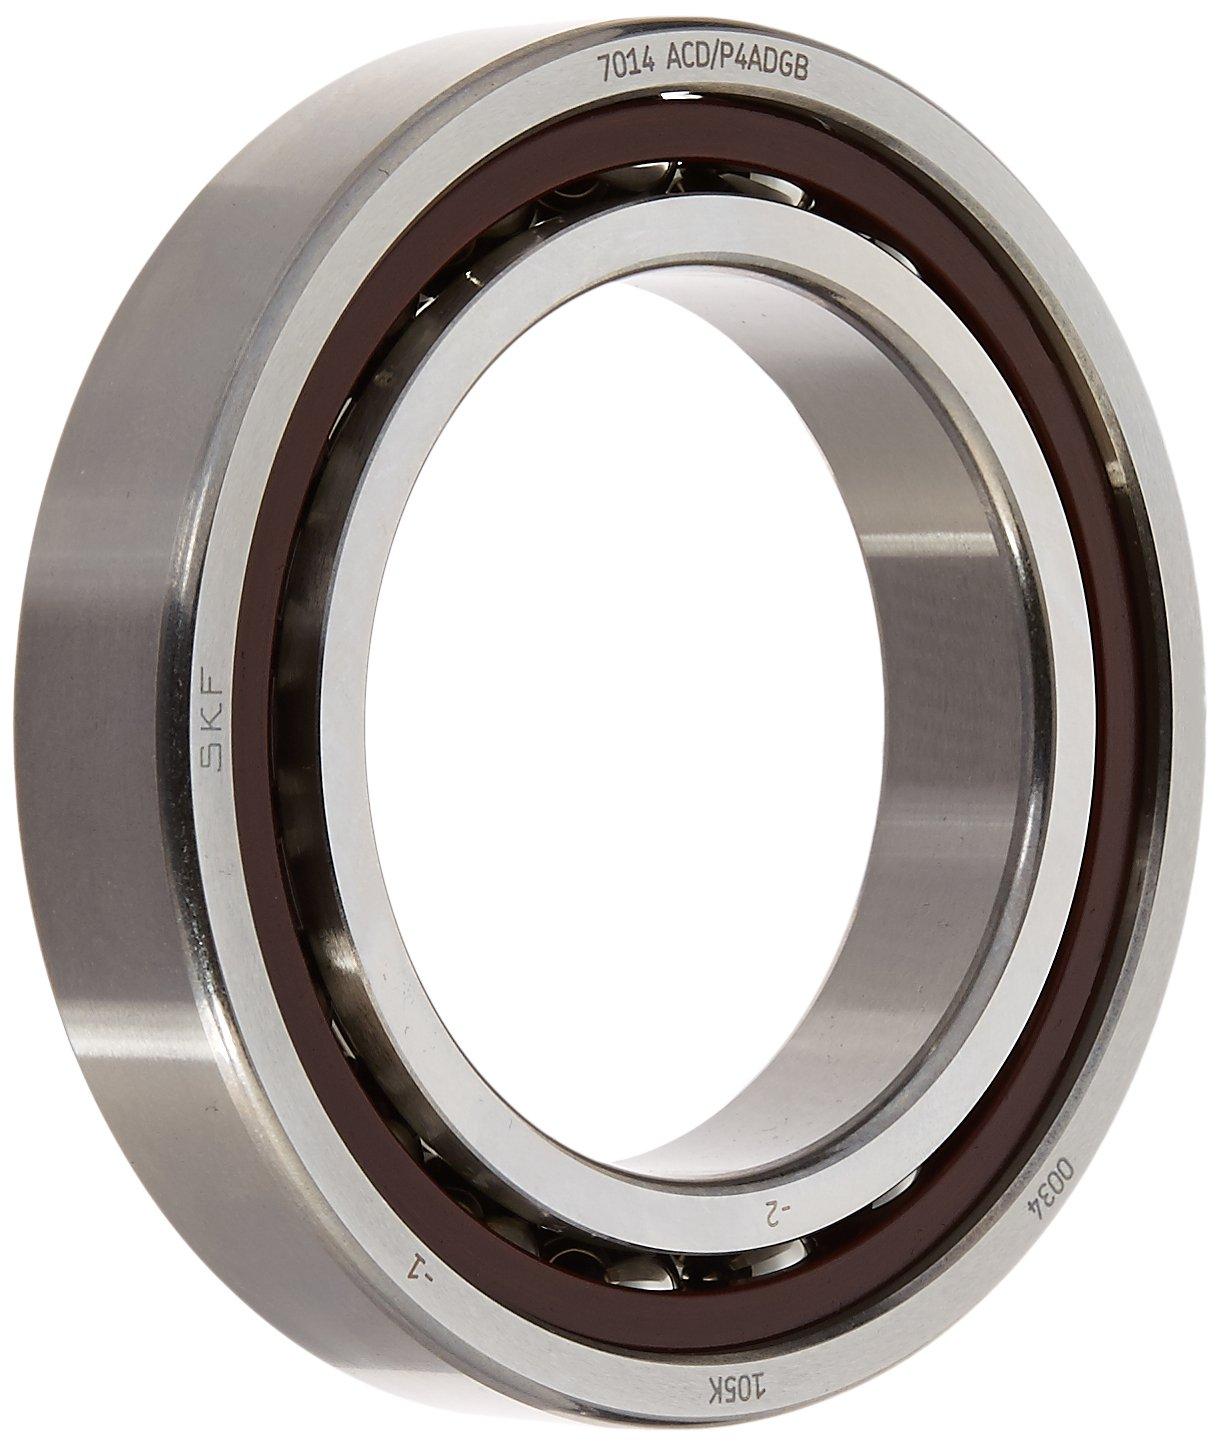 SKF 71914 ACD/P4ADGB Angular Contact Bearing, Duplex Set, Medium Preload, ABEC 7 - 9 Extra Precision, 25° Contact Angle, Universal Arrangement, Metric, 70mm Bore, 100mm OD, 16mm Width